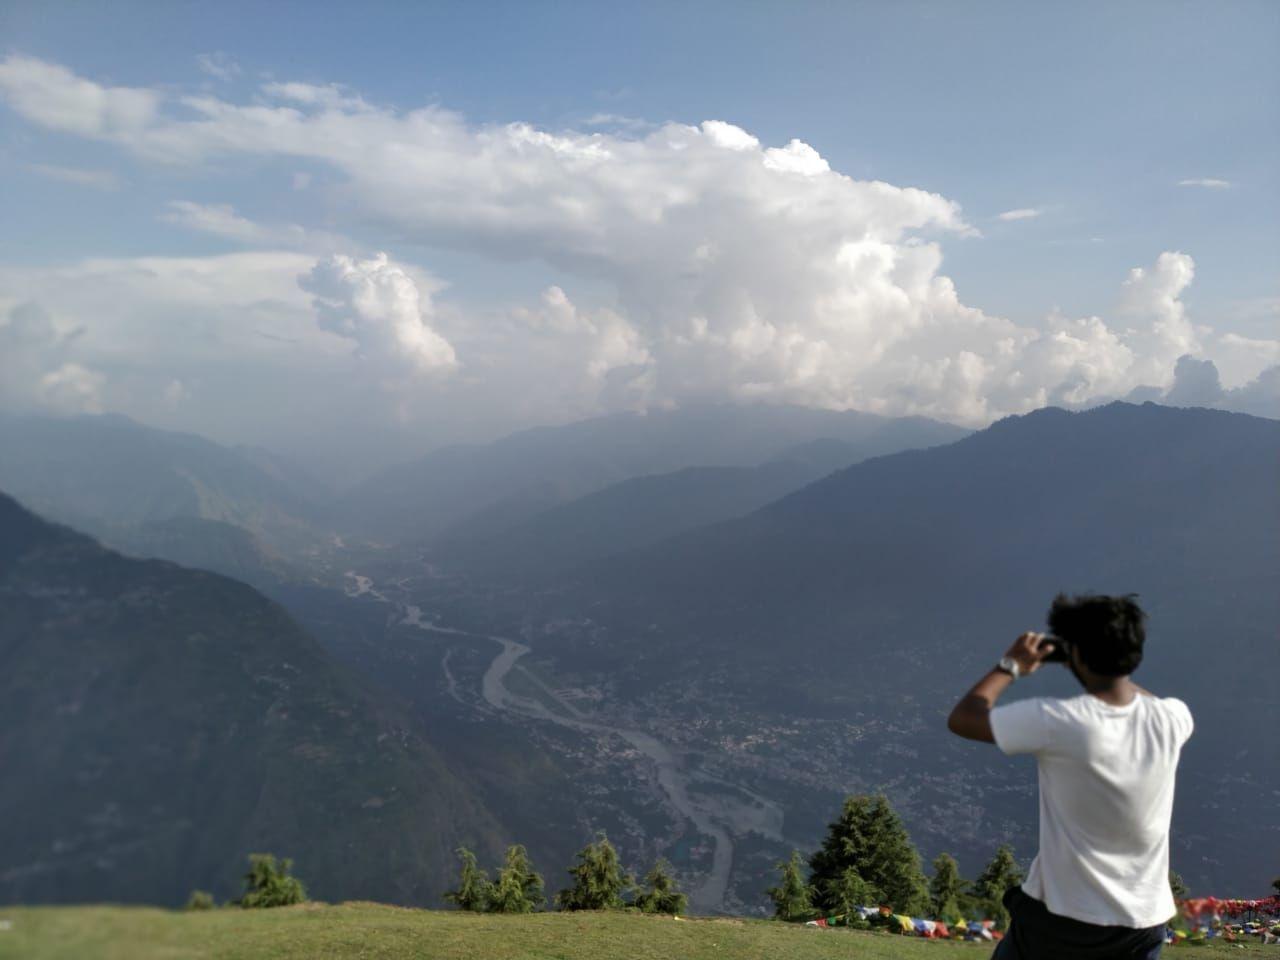 Photo of Himachal Pradesh By Rishi Gupta